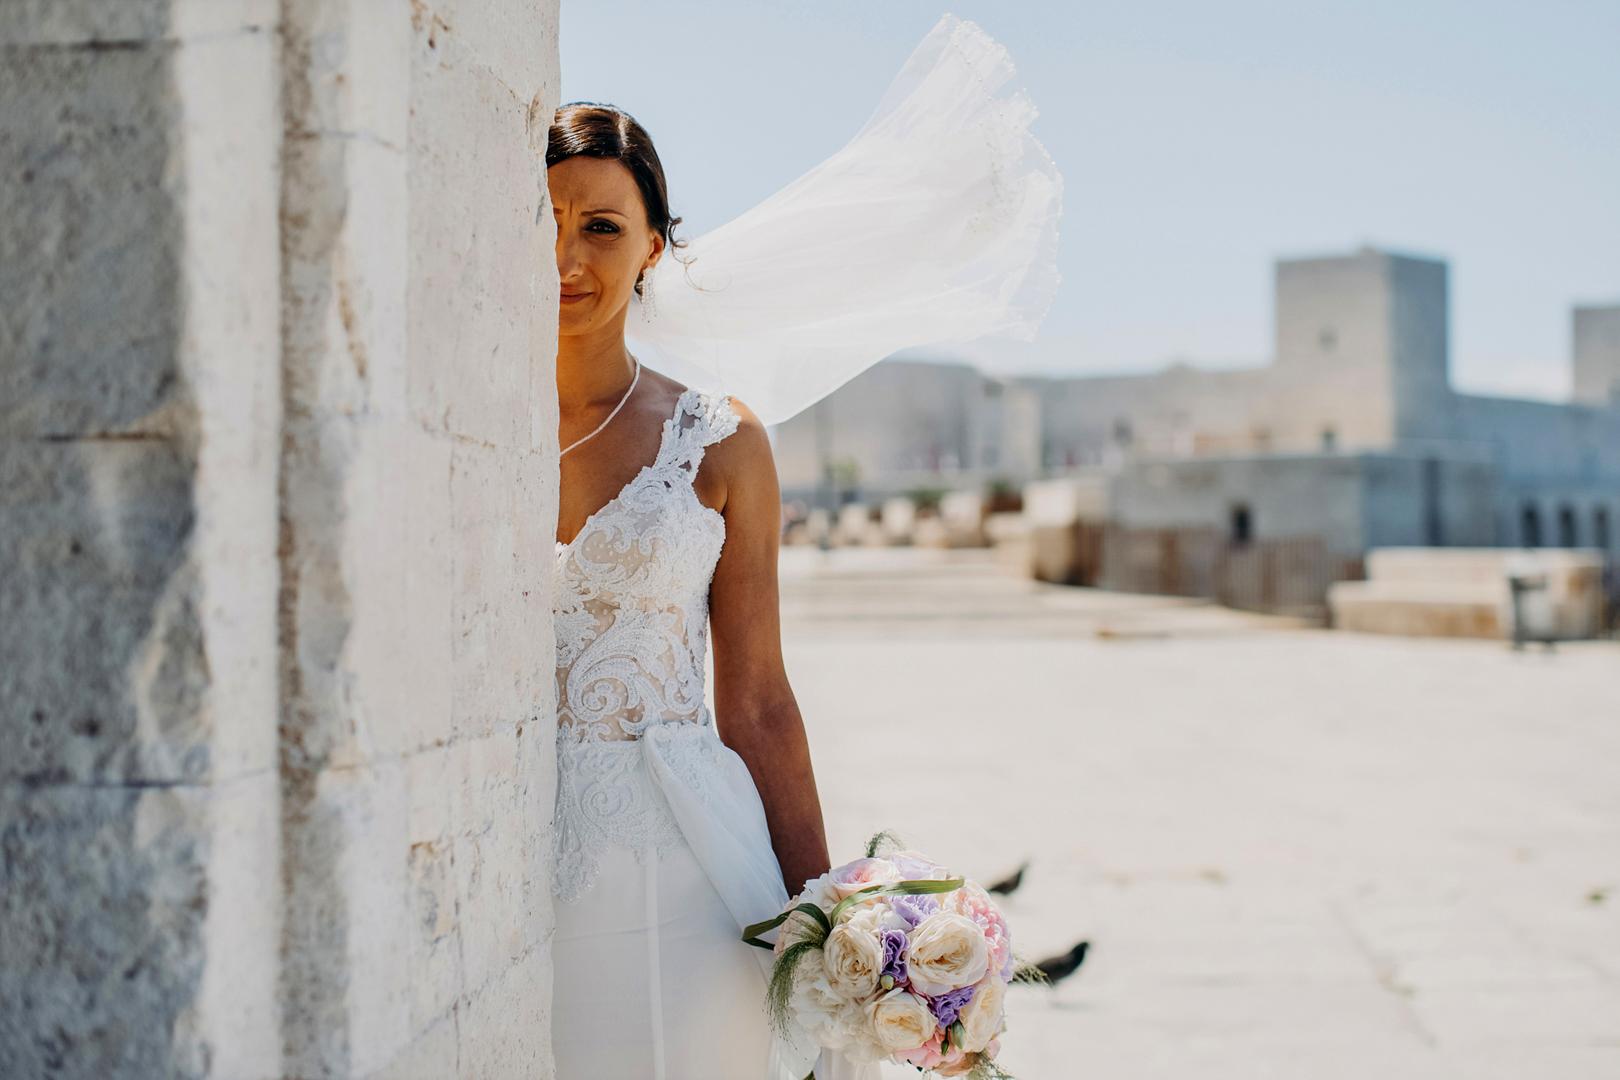 18 gianni-lepore-fotografo-sposa-trani-reportage-bride-weddingday